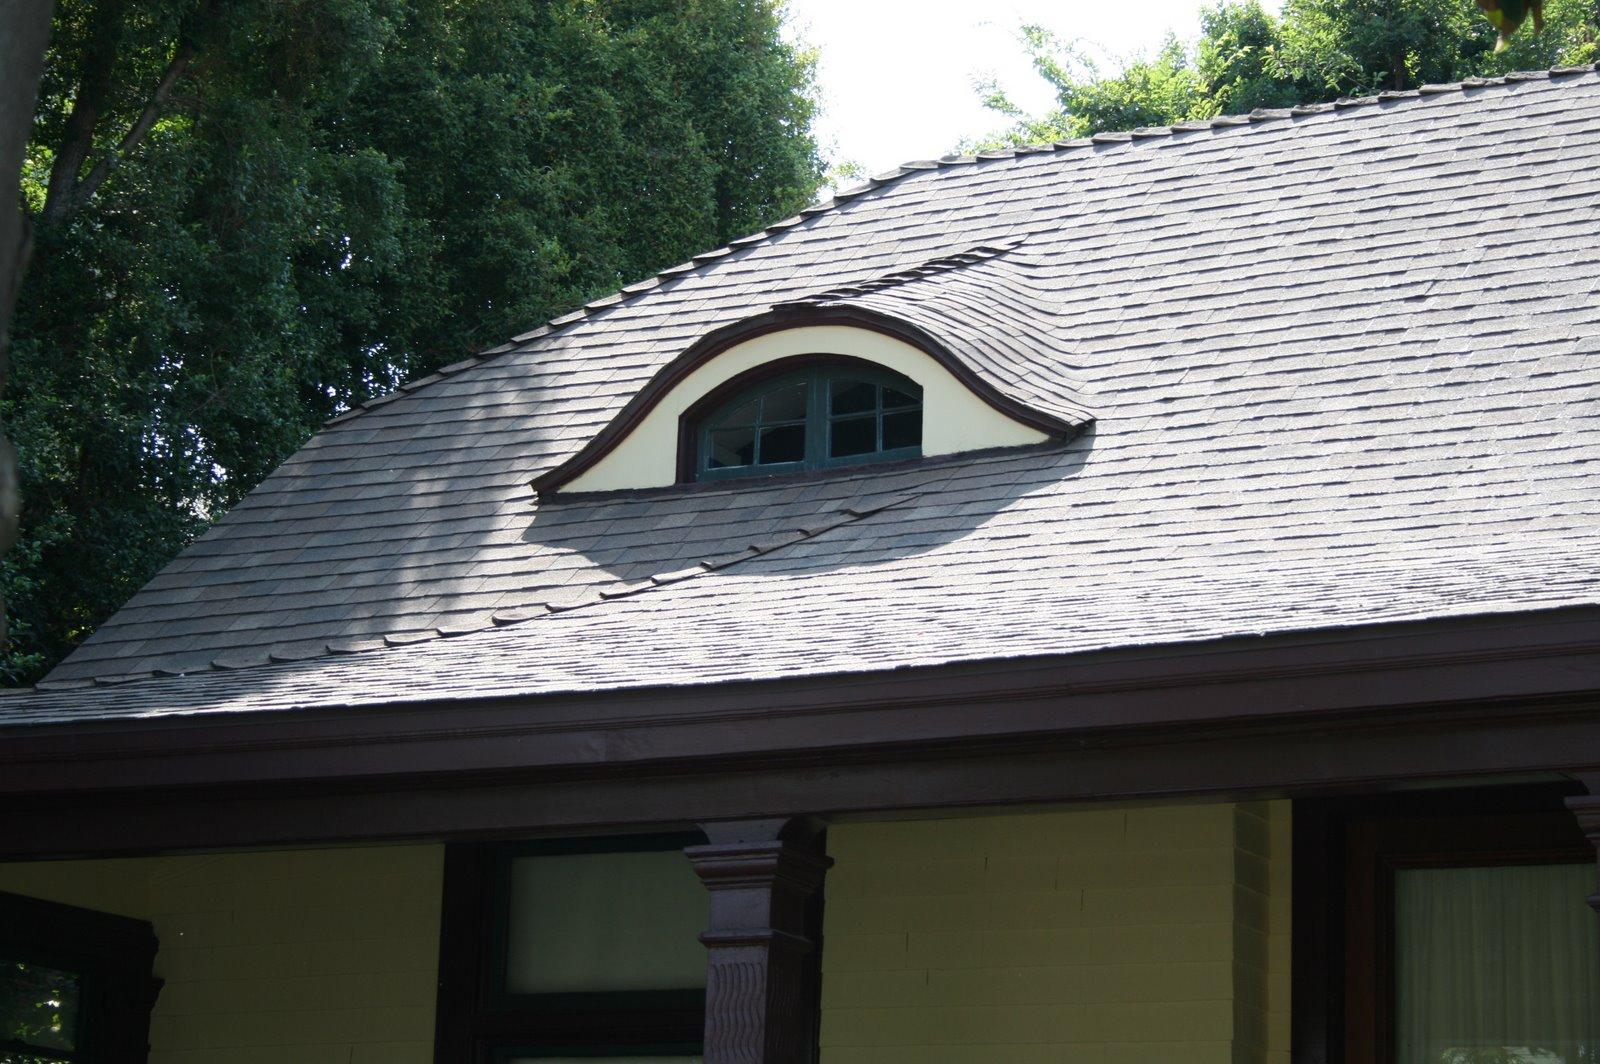 Recentering el pueblo eyebrow dormers - Houses roof windows ...